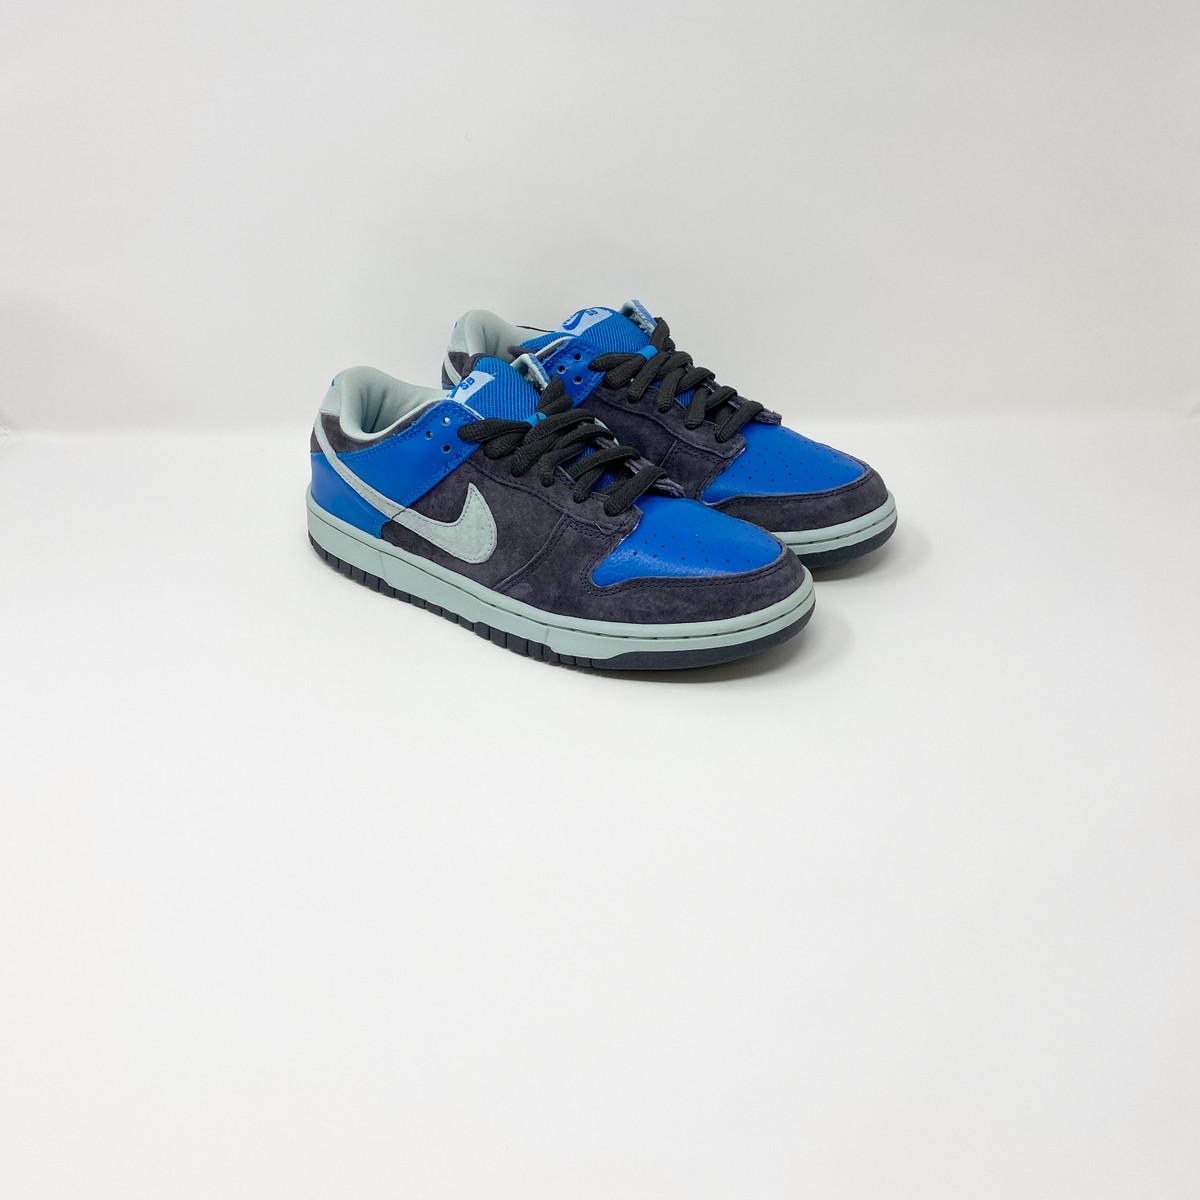 Nike Dunk Low Pro SB Aqua Chalk